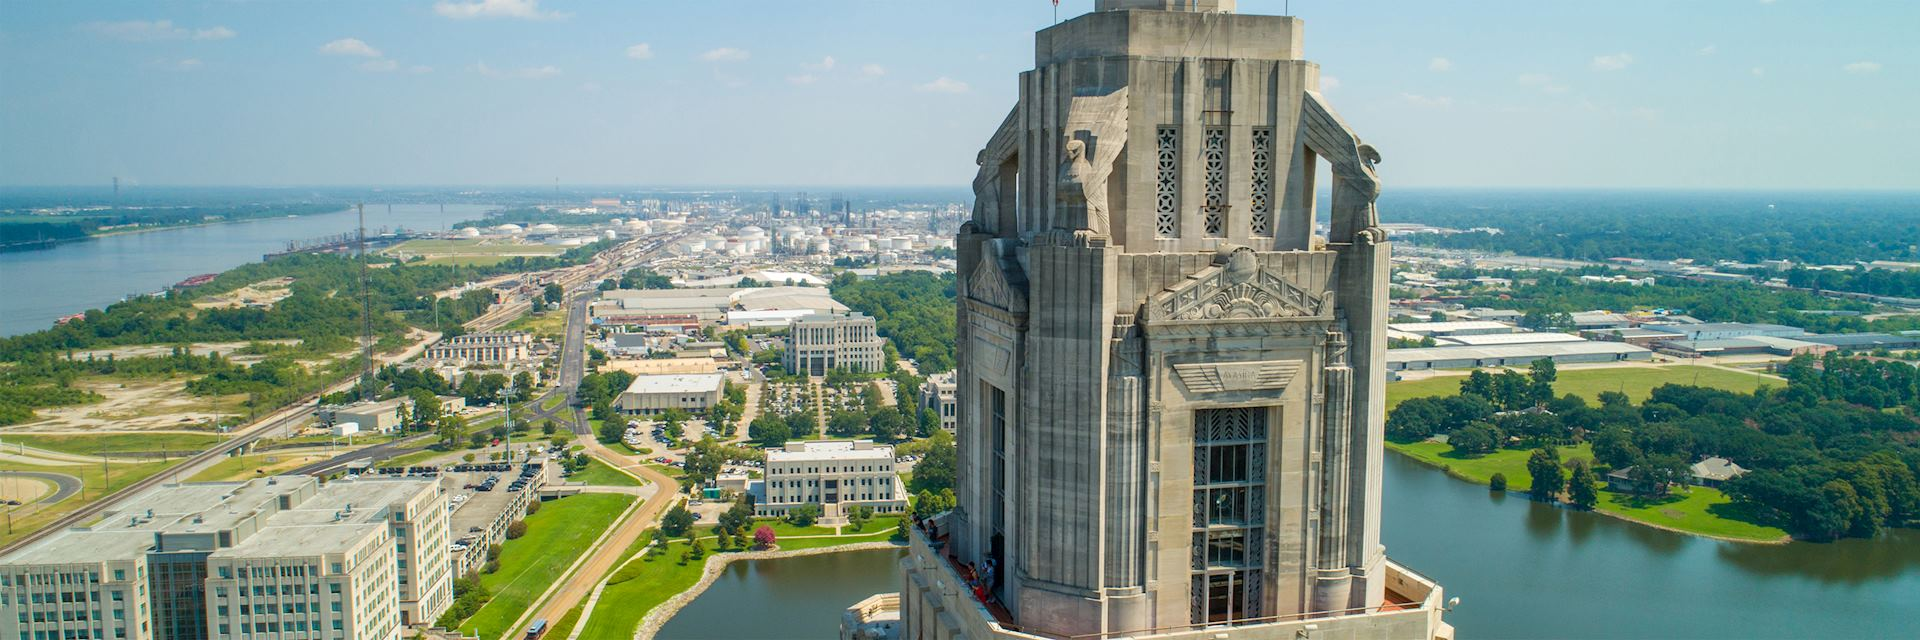 Louisiana State Capitol Building, Baton Rouge